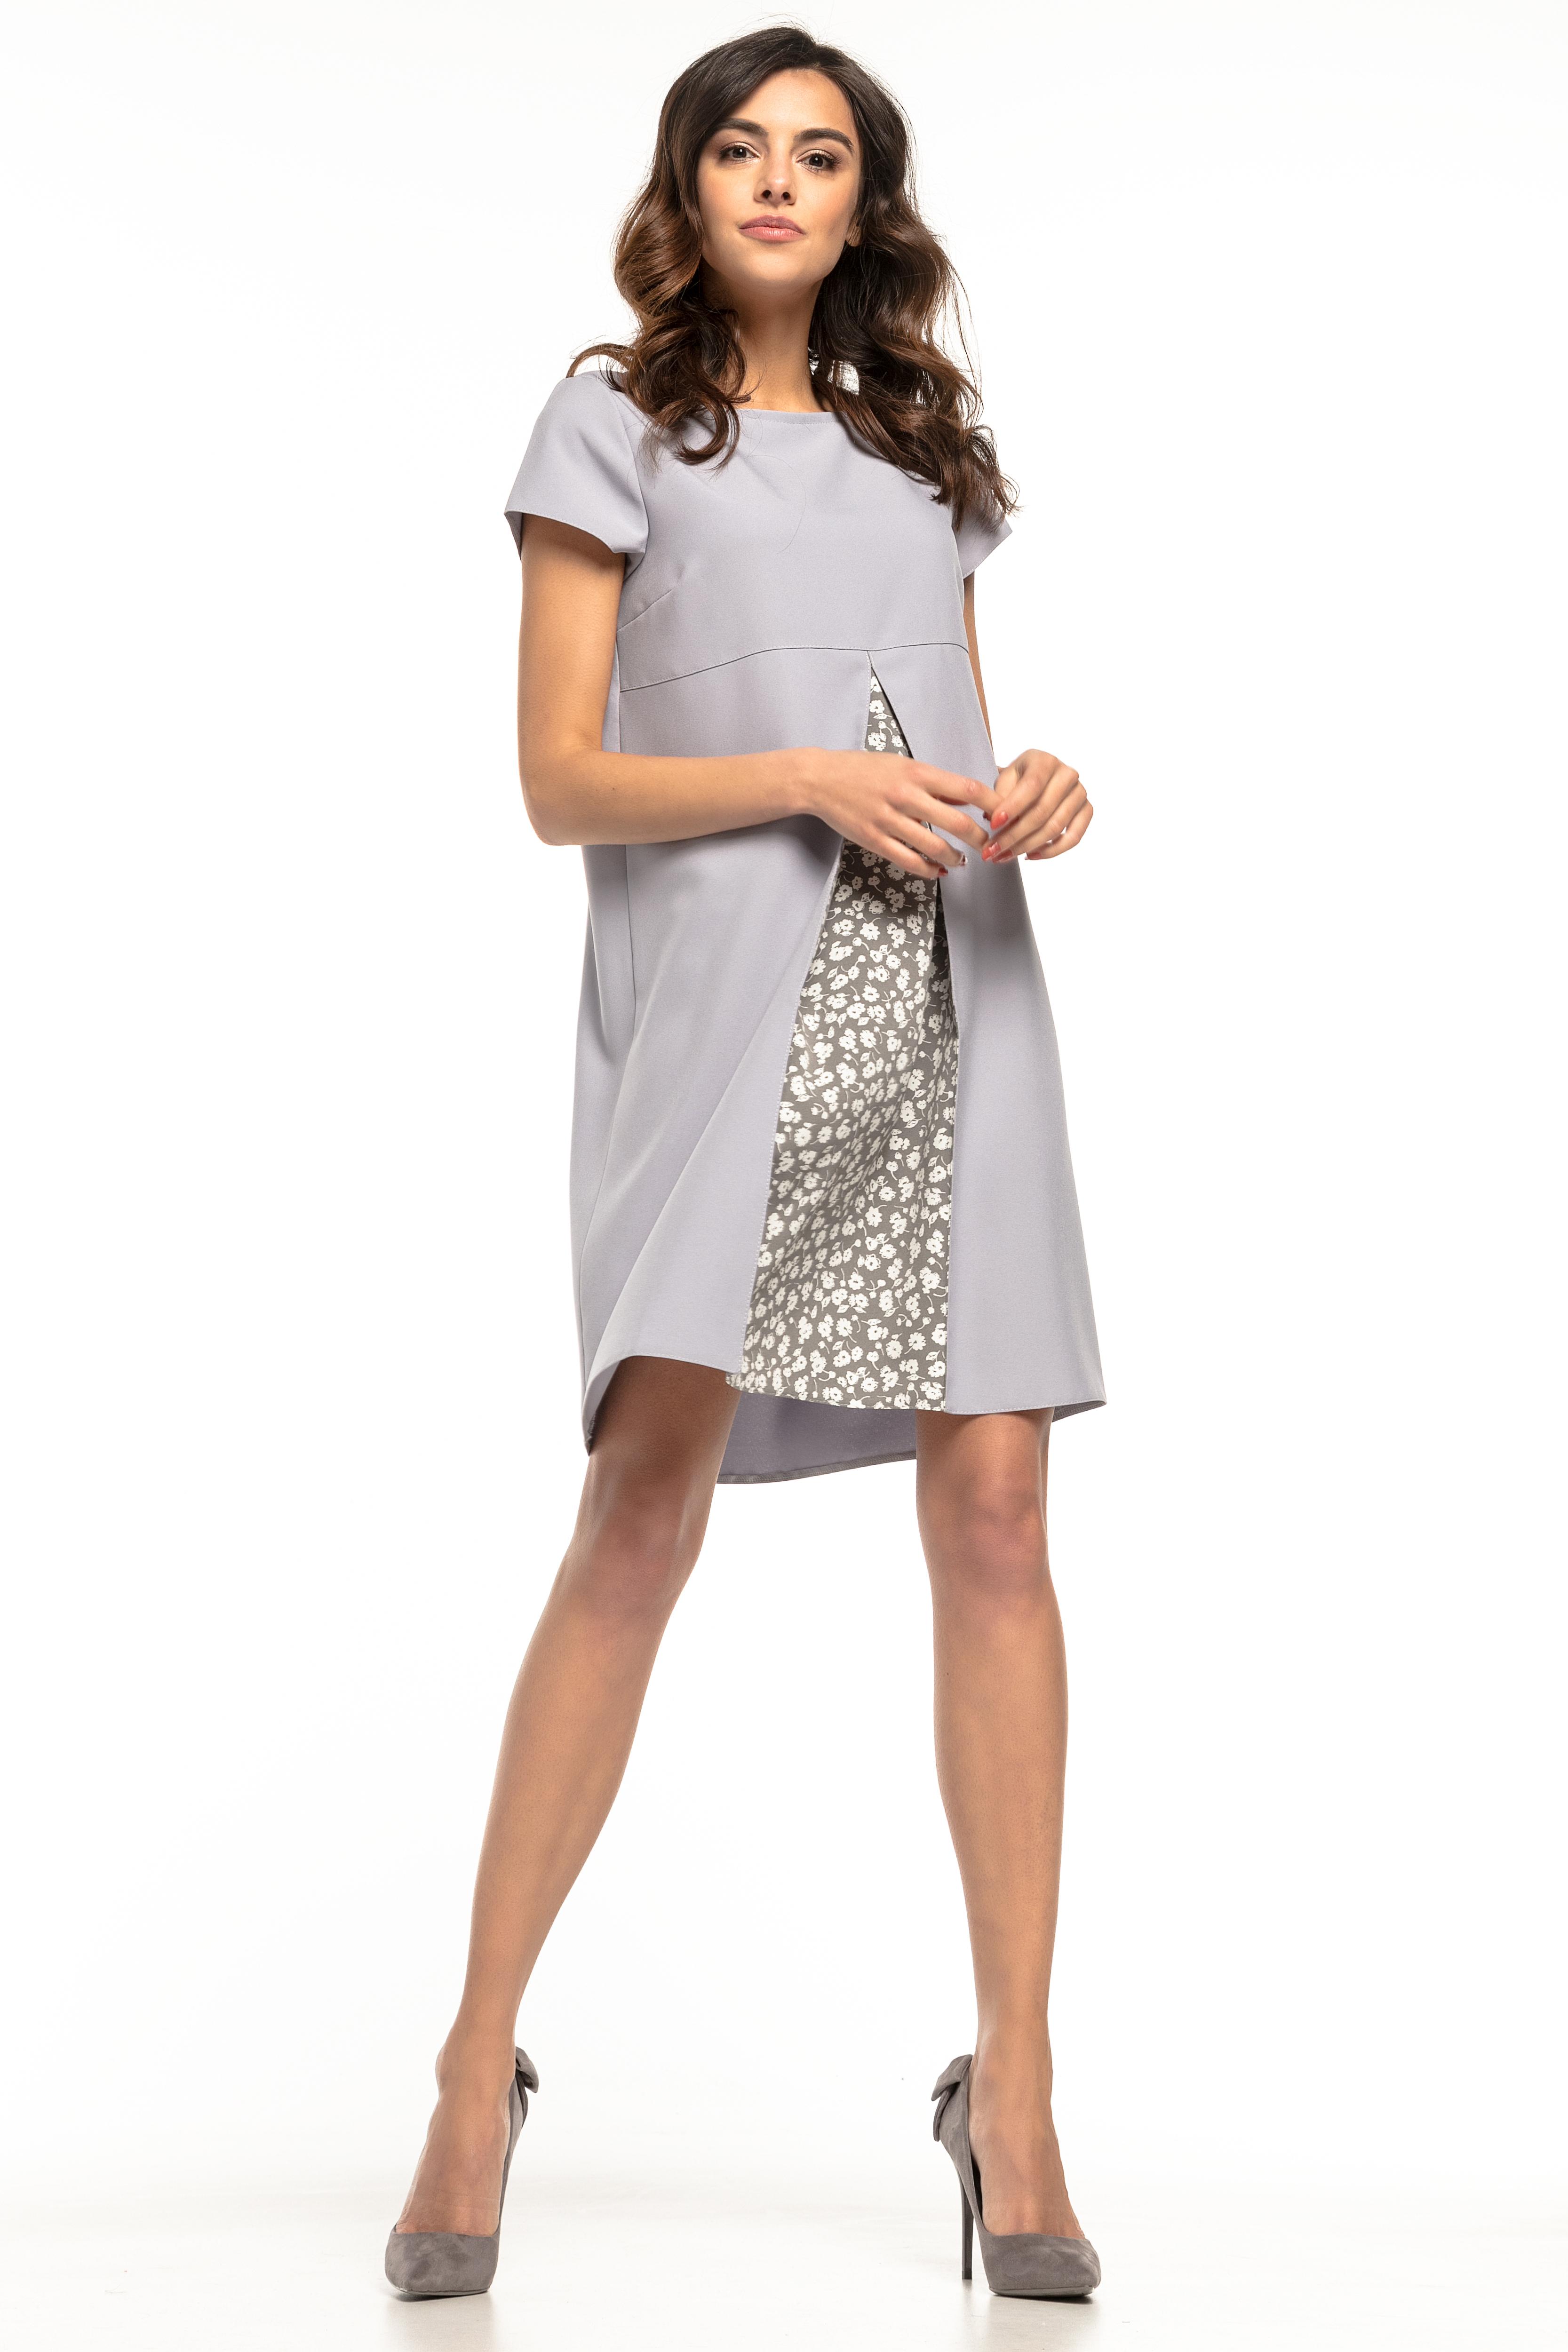 f7fe28286b7412 Sukienka trapezowa elegancka szara - tania dostawa już od 5,99 zł